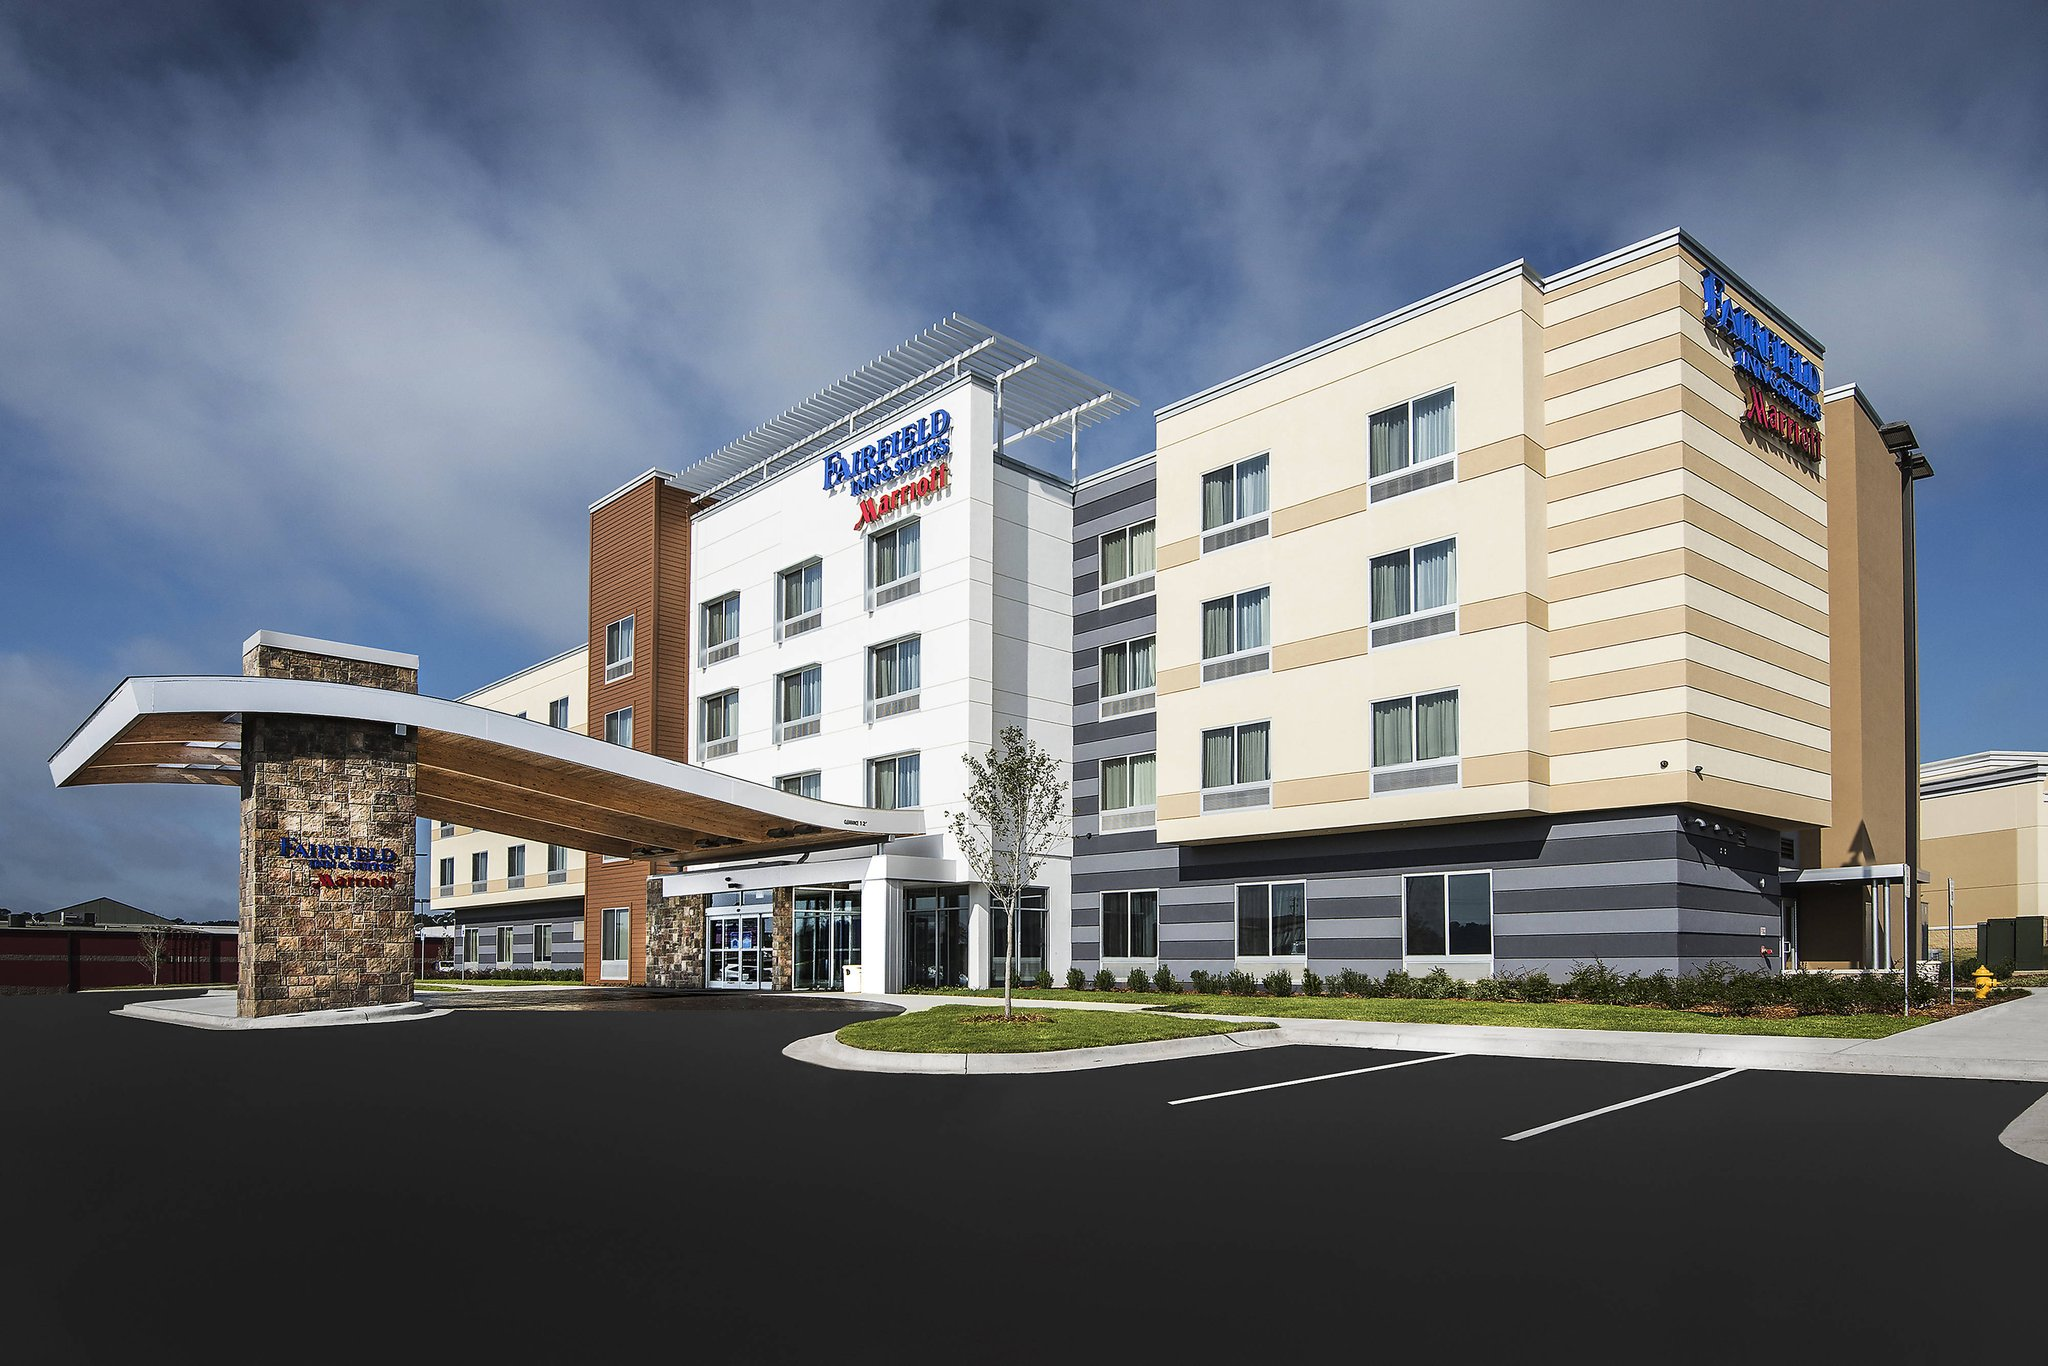 Fairfield Inn & Suites Little Rock